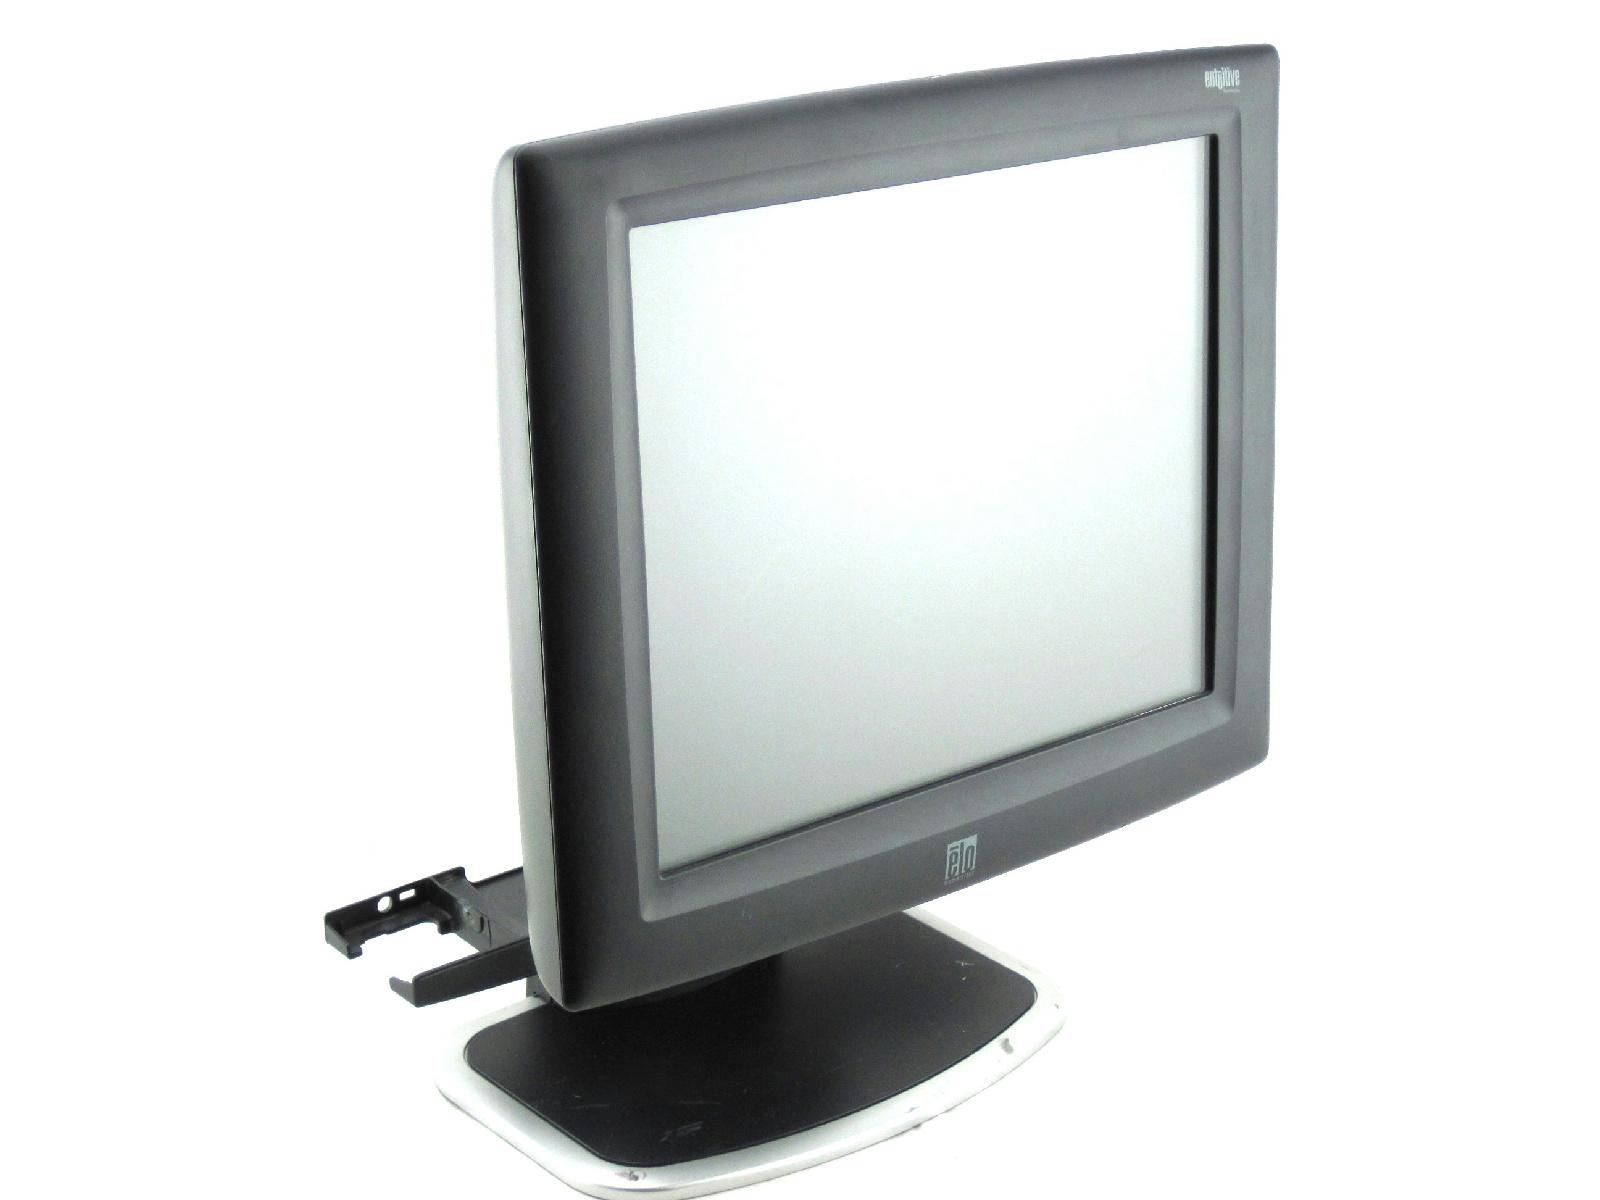 intel desktop board d33025 manual